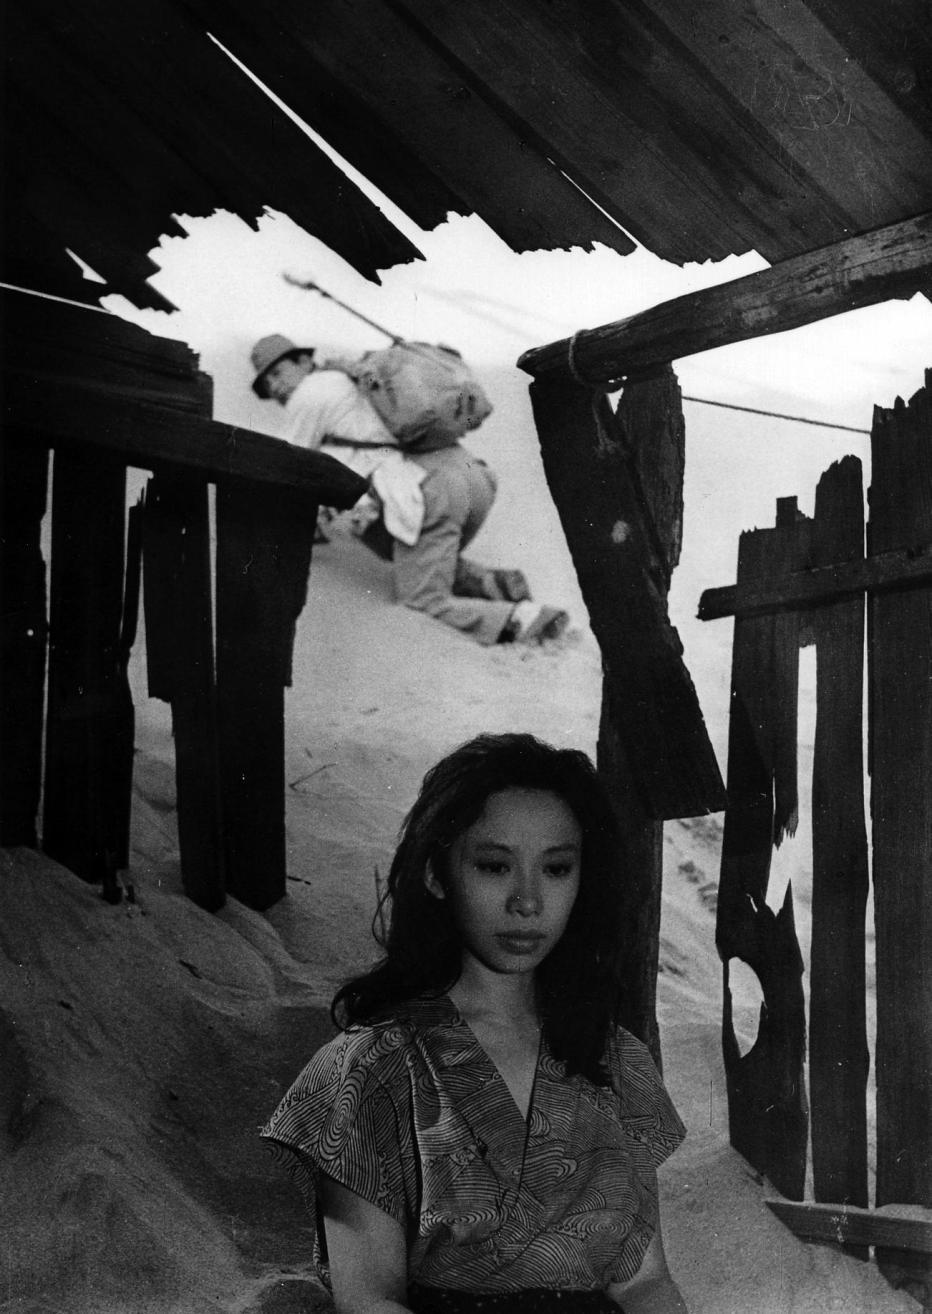 la-donna-di-sabbia-1964-hiroshi-teshigahara-14.jpg